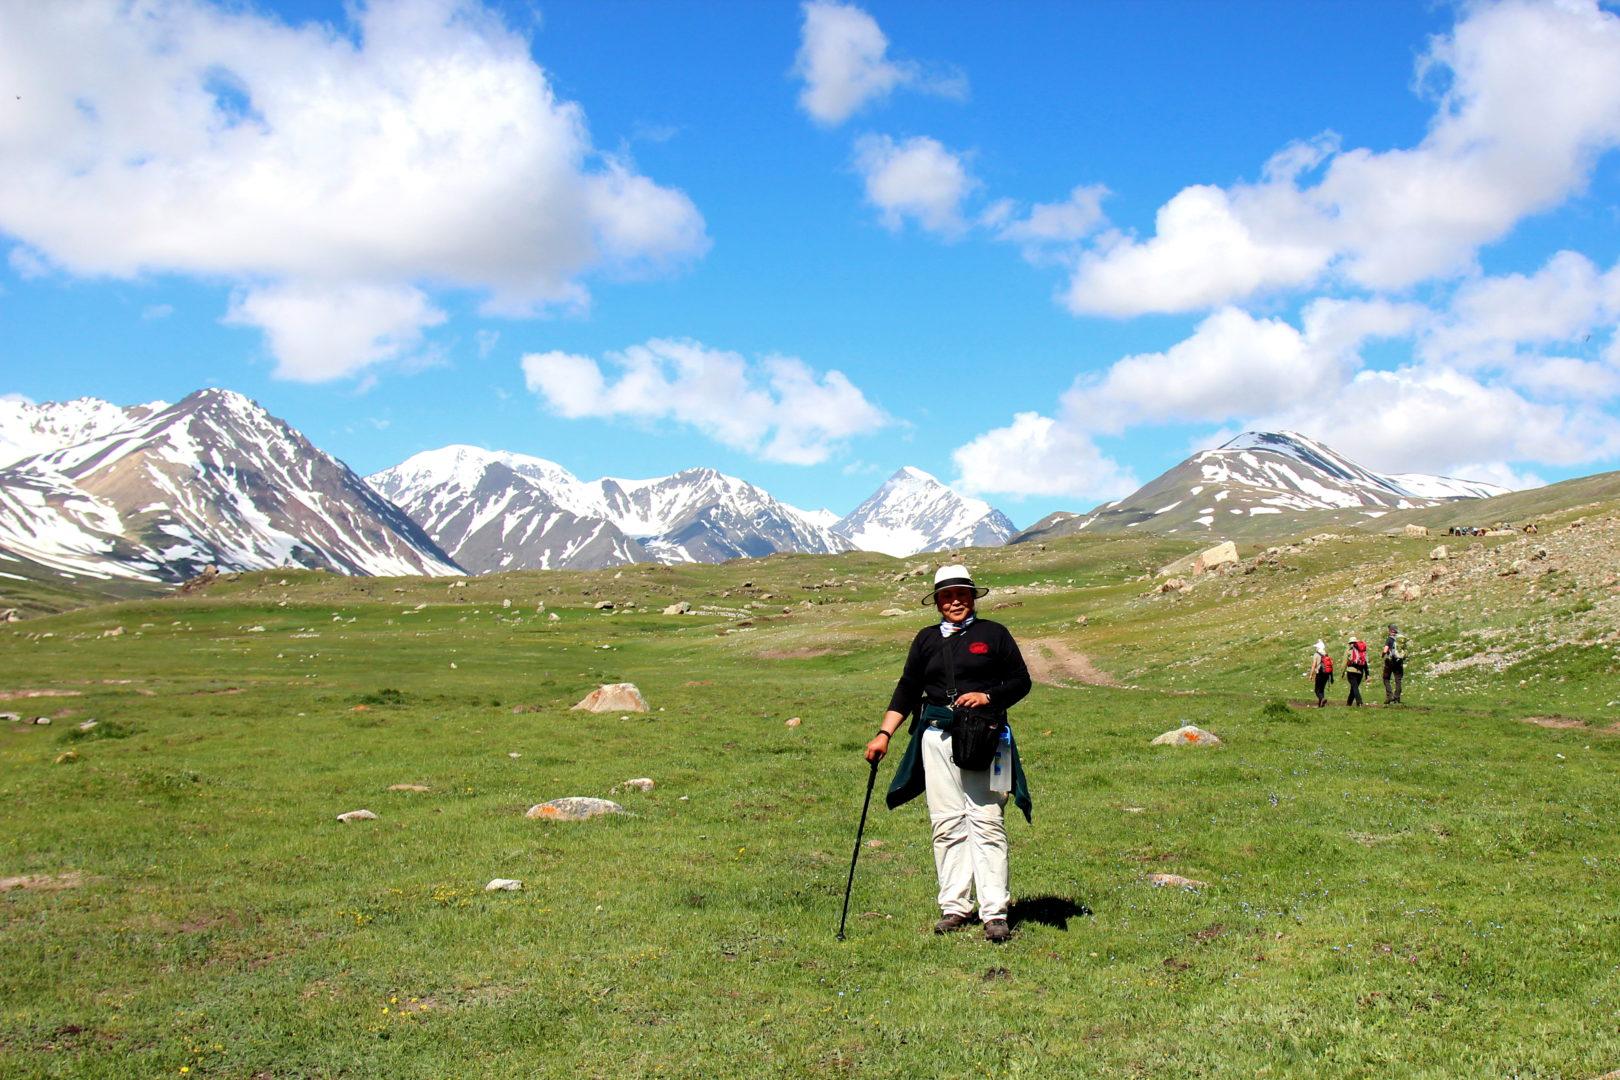 Mongolei-Reise: Wanderung am Altai-Gebirge